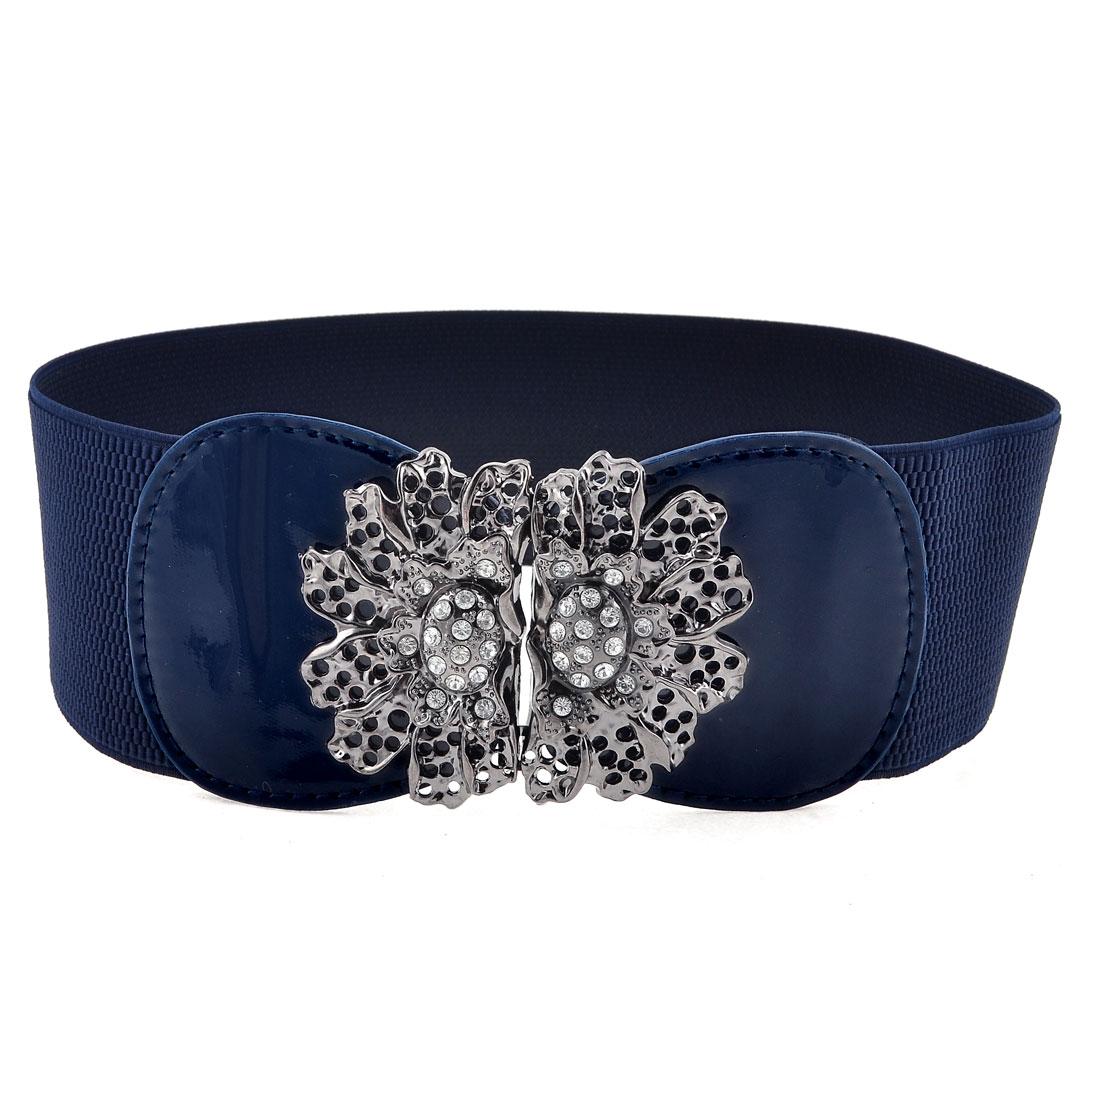 Ladies Hook Buckle Closure Textured Elastic Waist Belt Corset Band Navy Blue(China (Mainland))